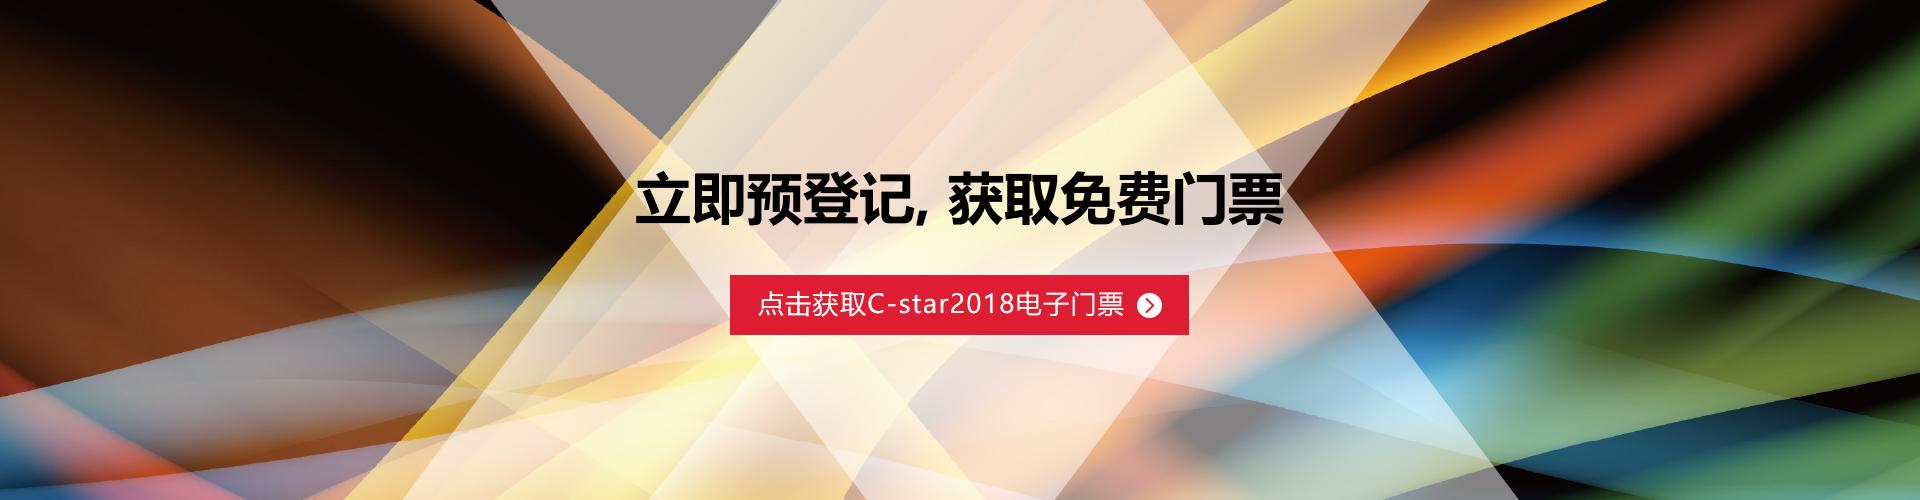 首页预登记banner-cn